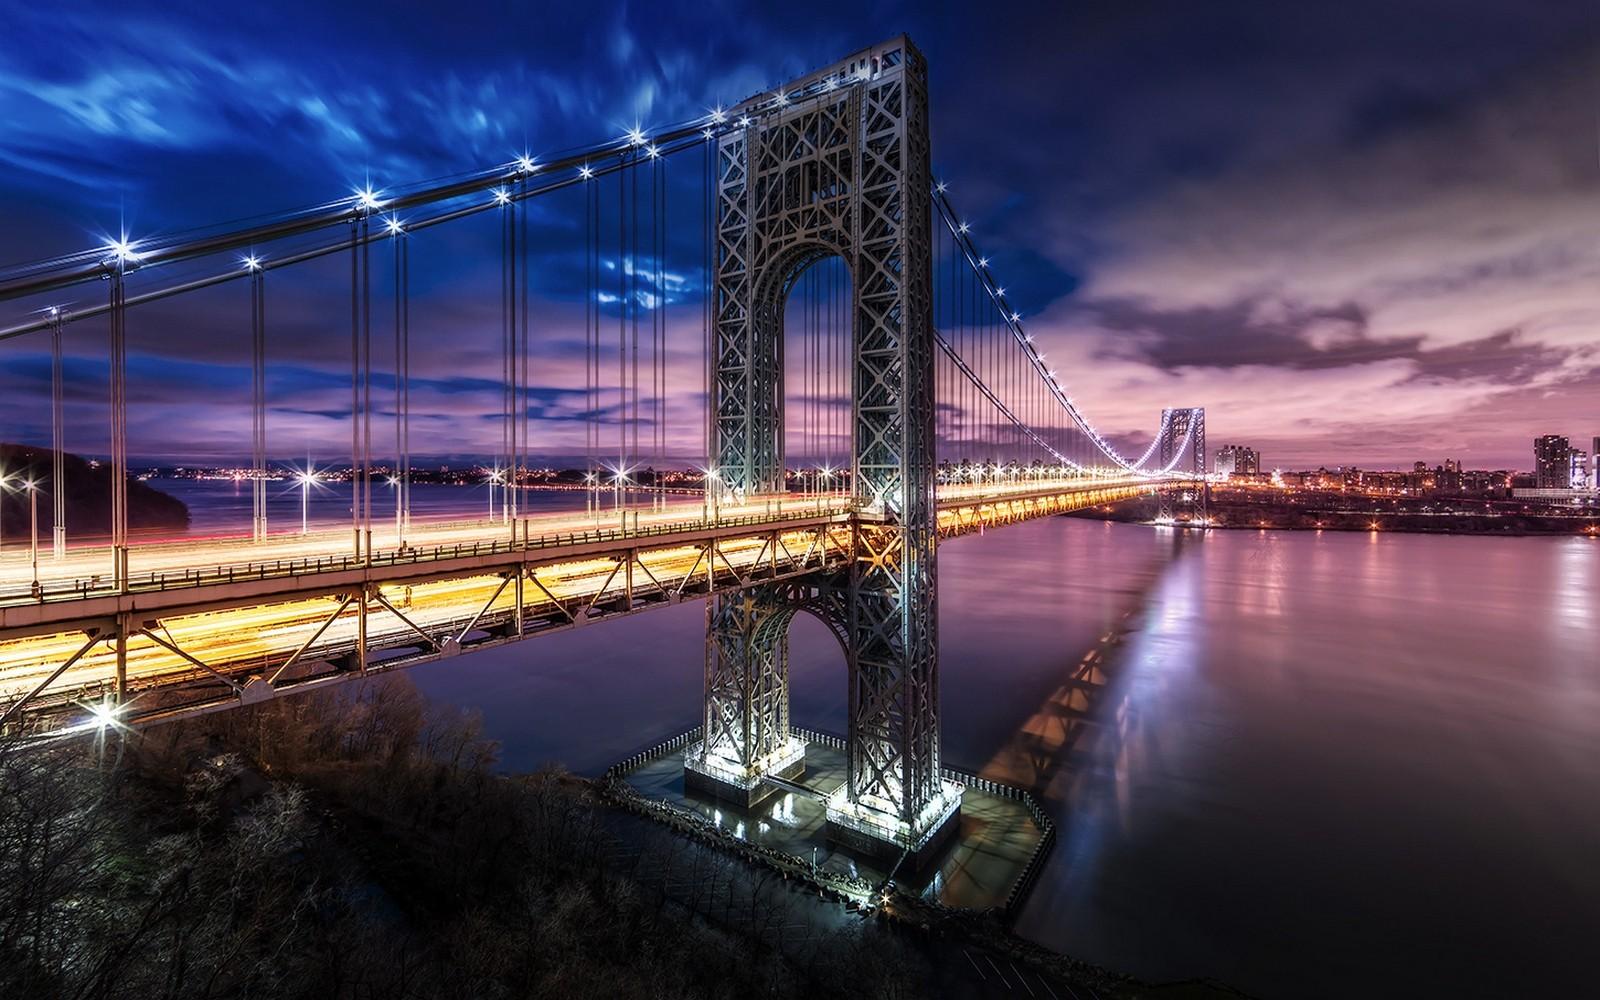 George Washington Bridge Wallpaper 14   1600 X 1000 stmednet 1600x1000